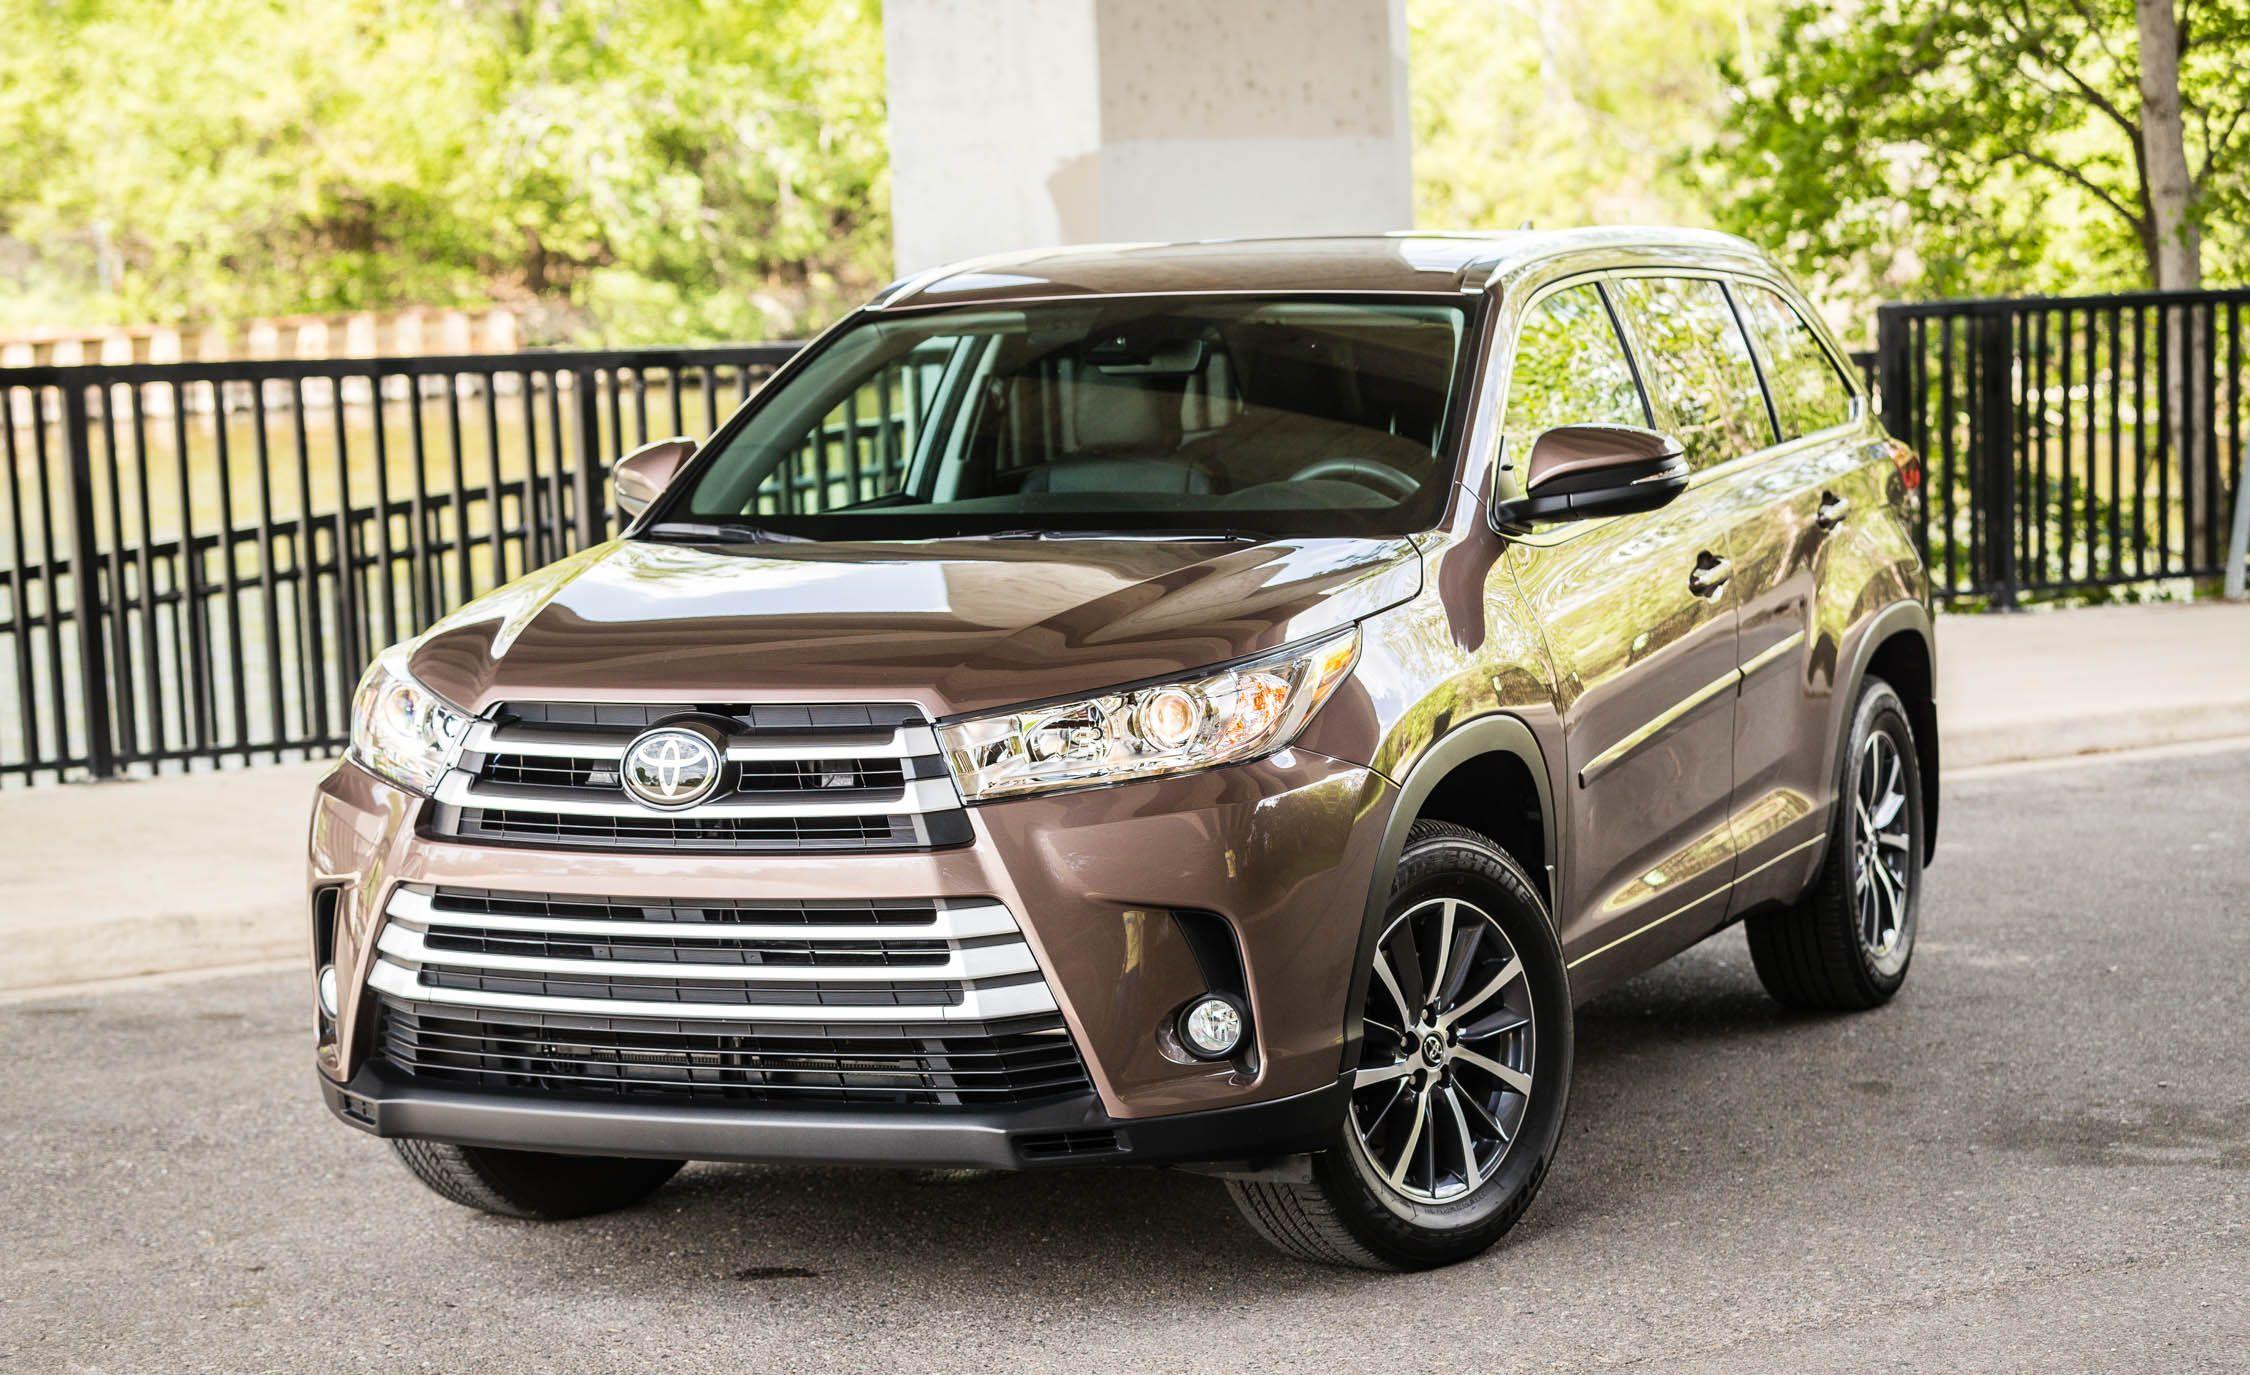 2017 Toyota Highlander Hybrid Awd Test Review Car And Driver Engine Diagram For 2013